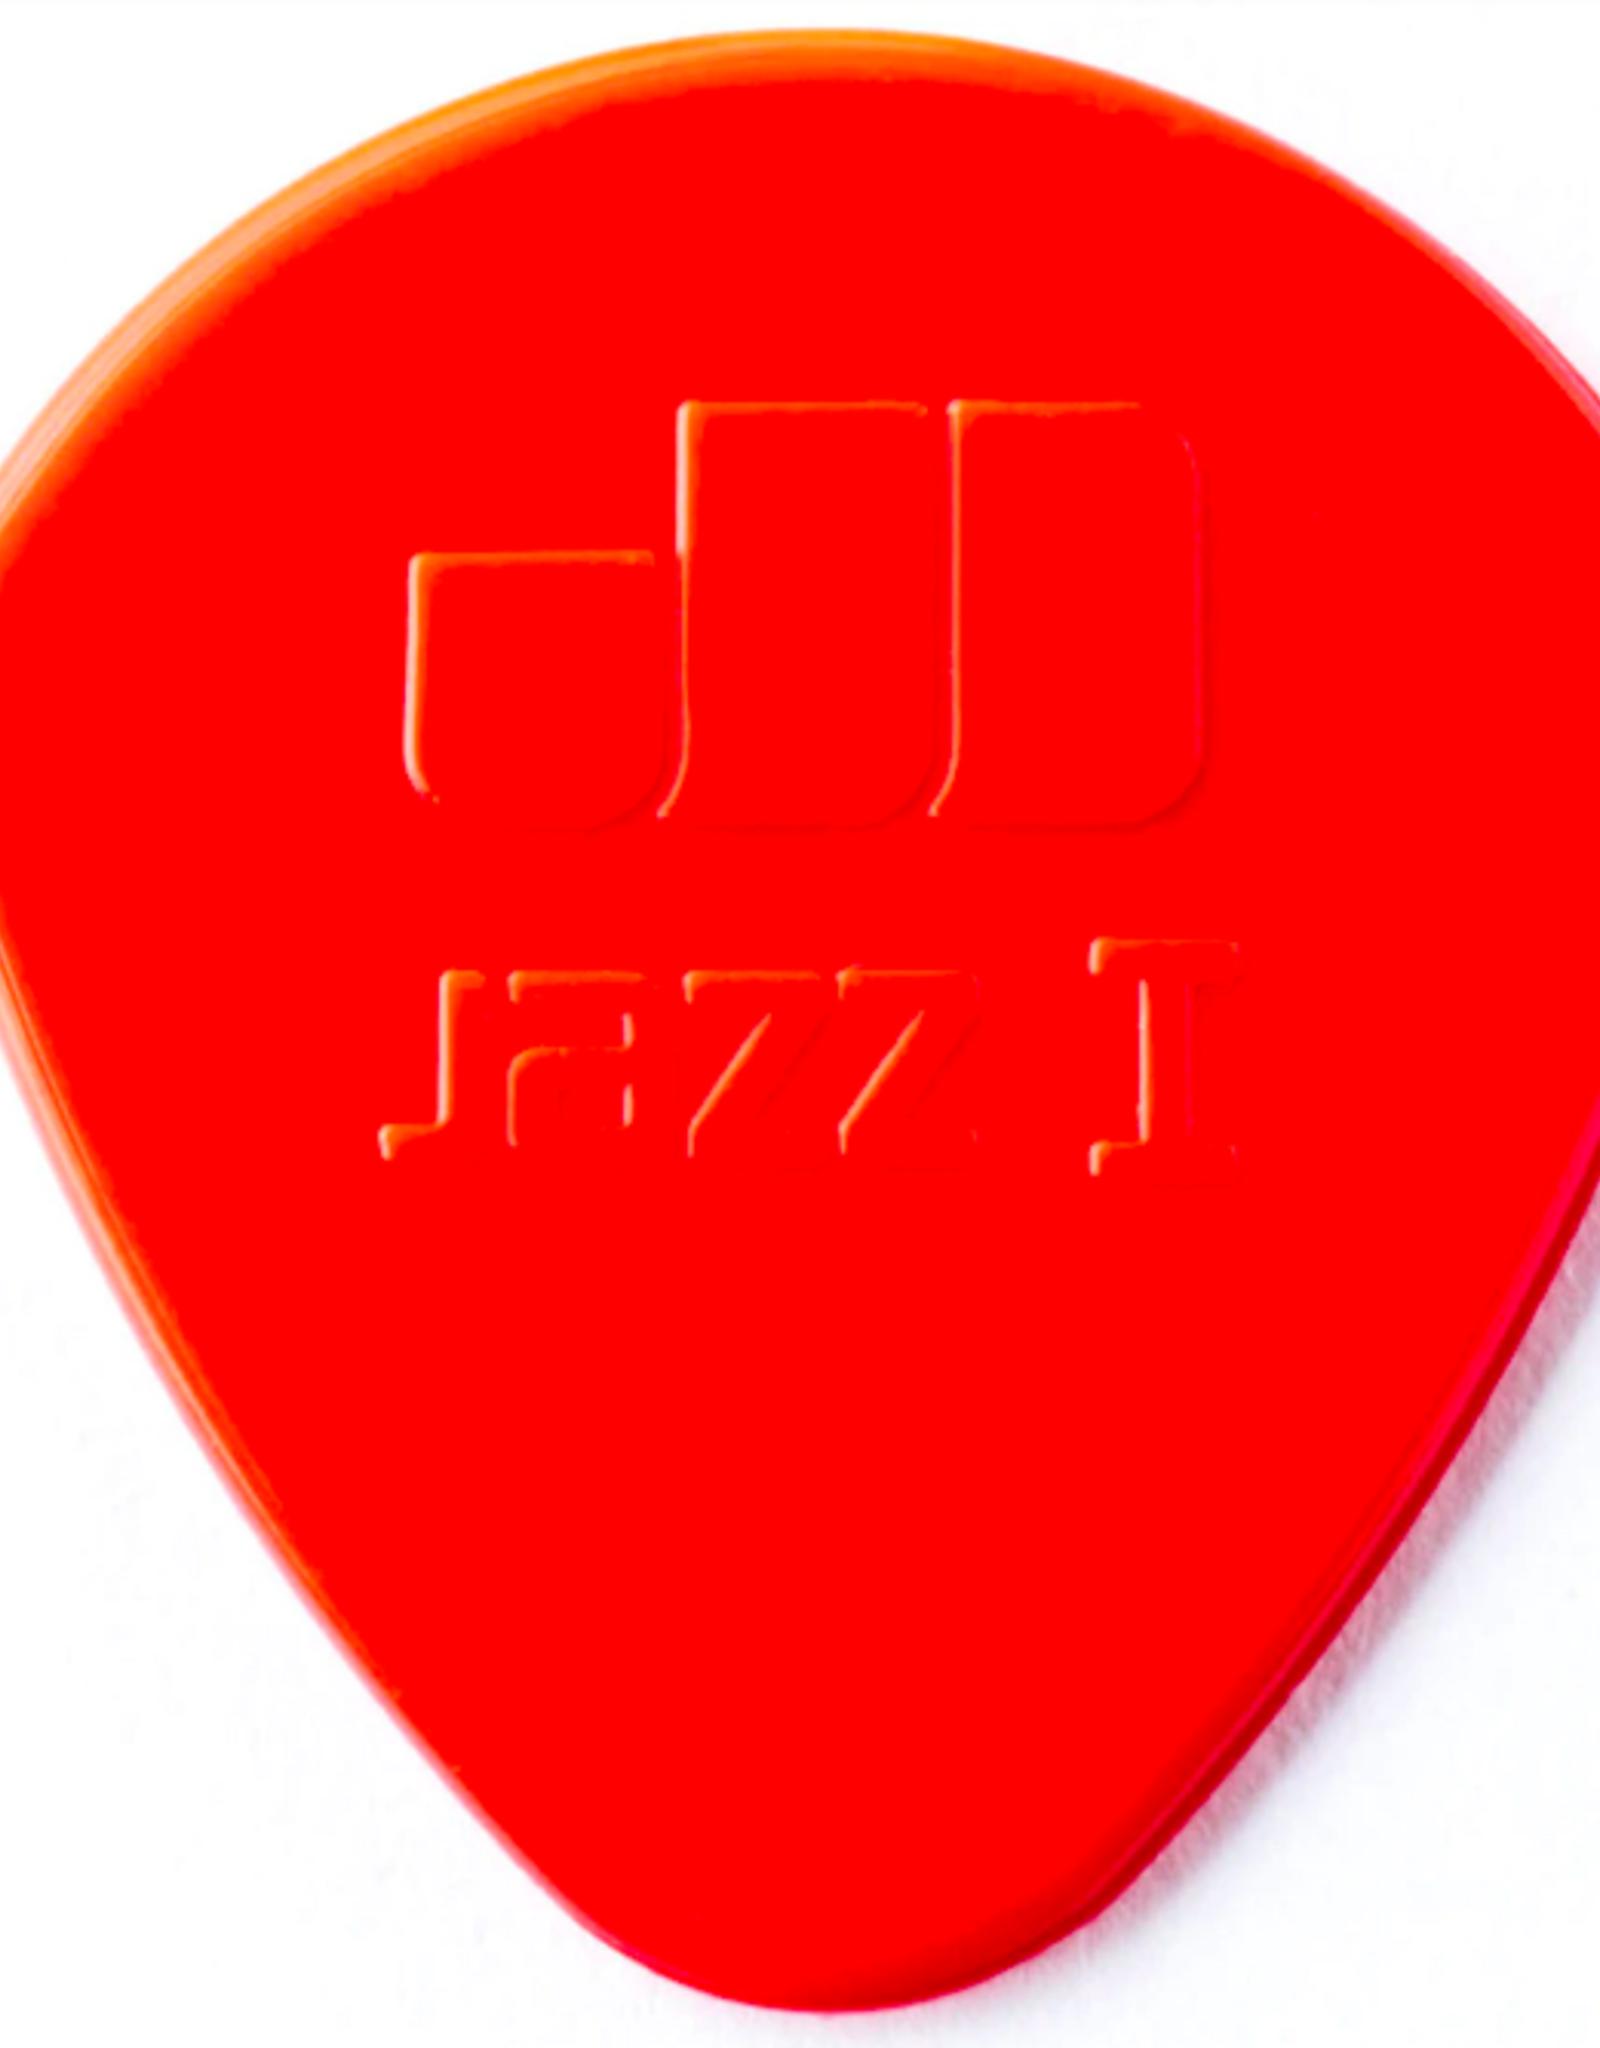 Dunlop Dunlop Nylon Jazz III -Stiffo Picks Player Pack